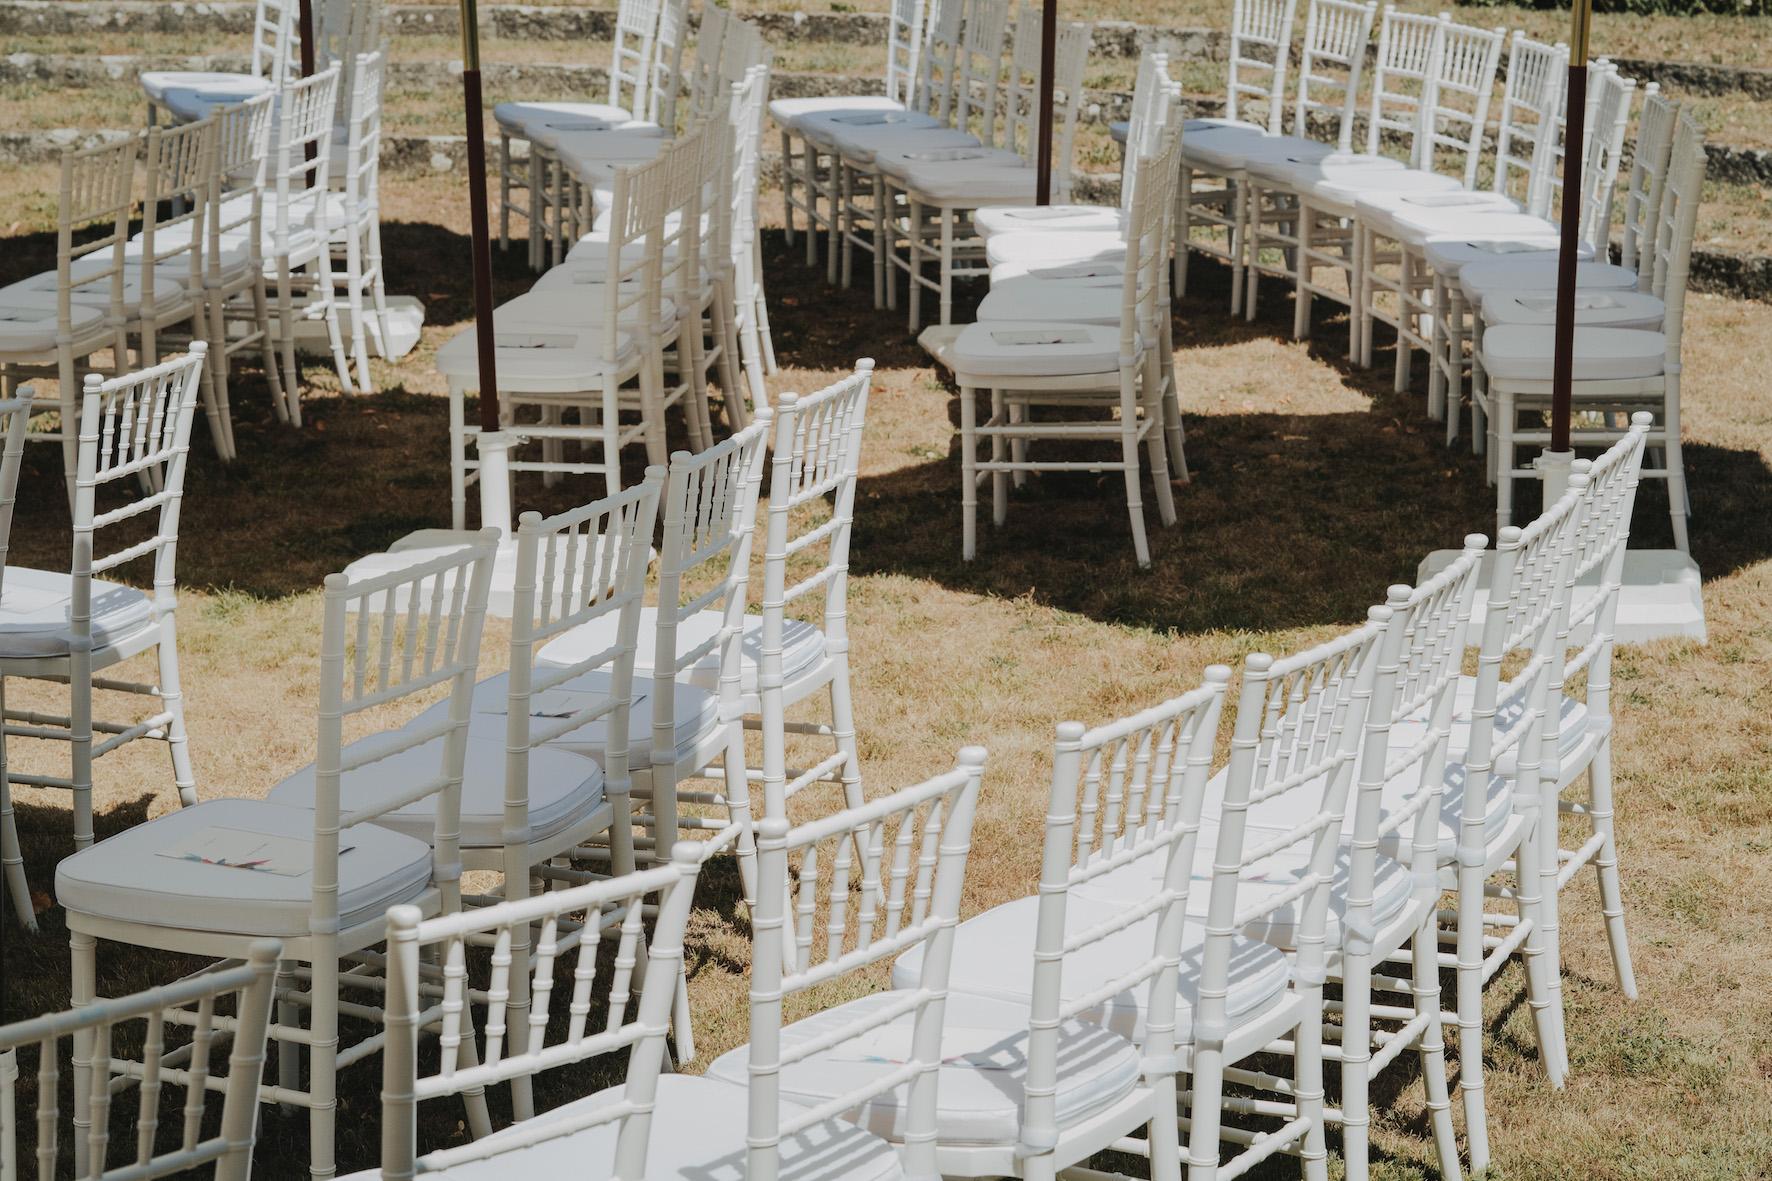 201807273210JC_wedding-0089920180824-Kopie.jpg